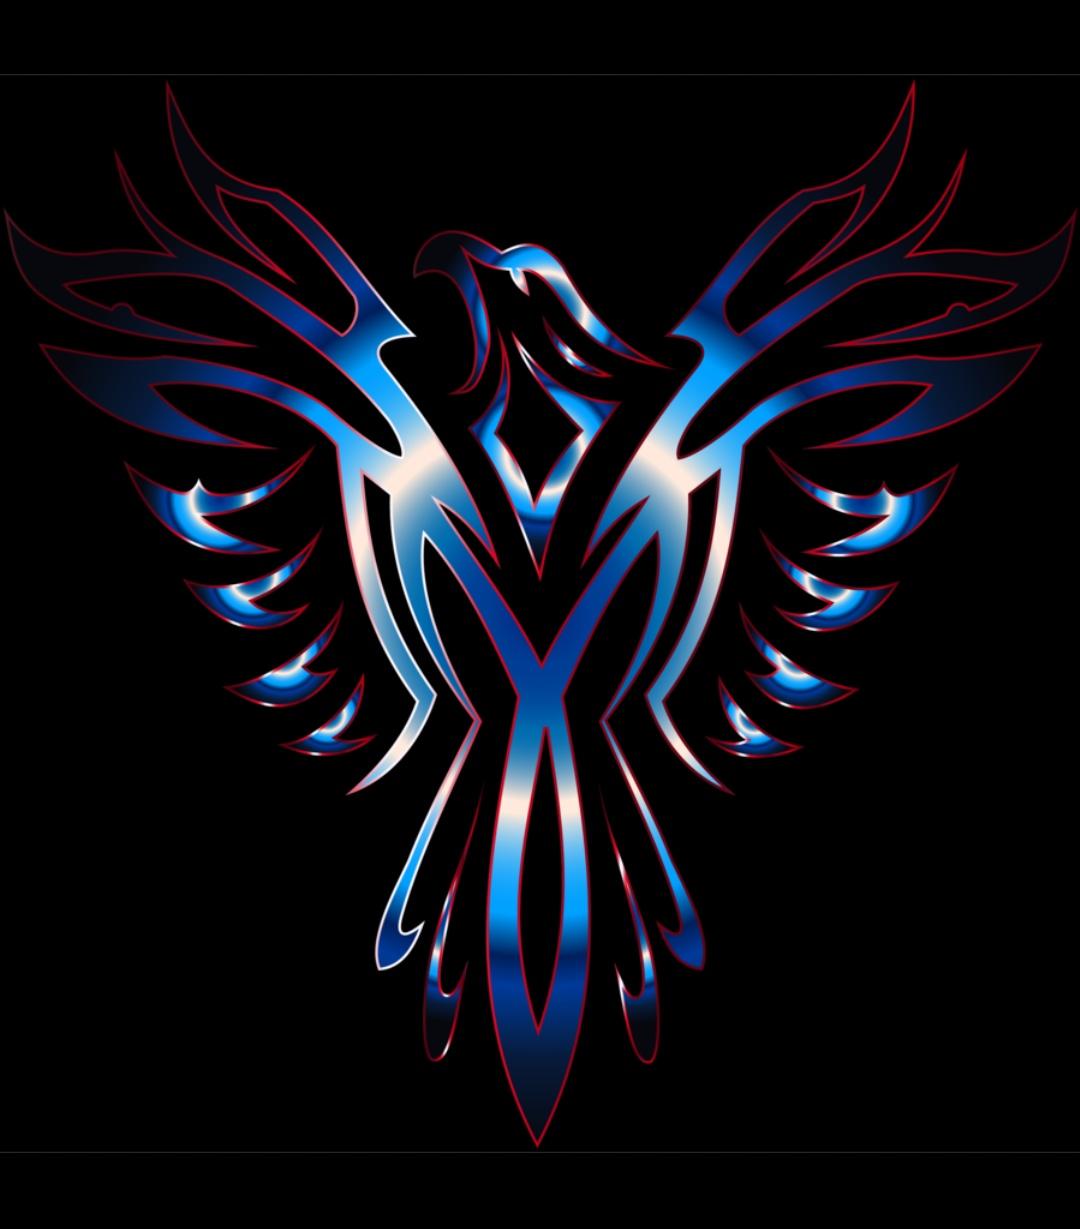 Логотип и фирменный стиль для магазина тканей. фото f_9615cd9c8eeb95f0.jpg